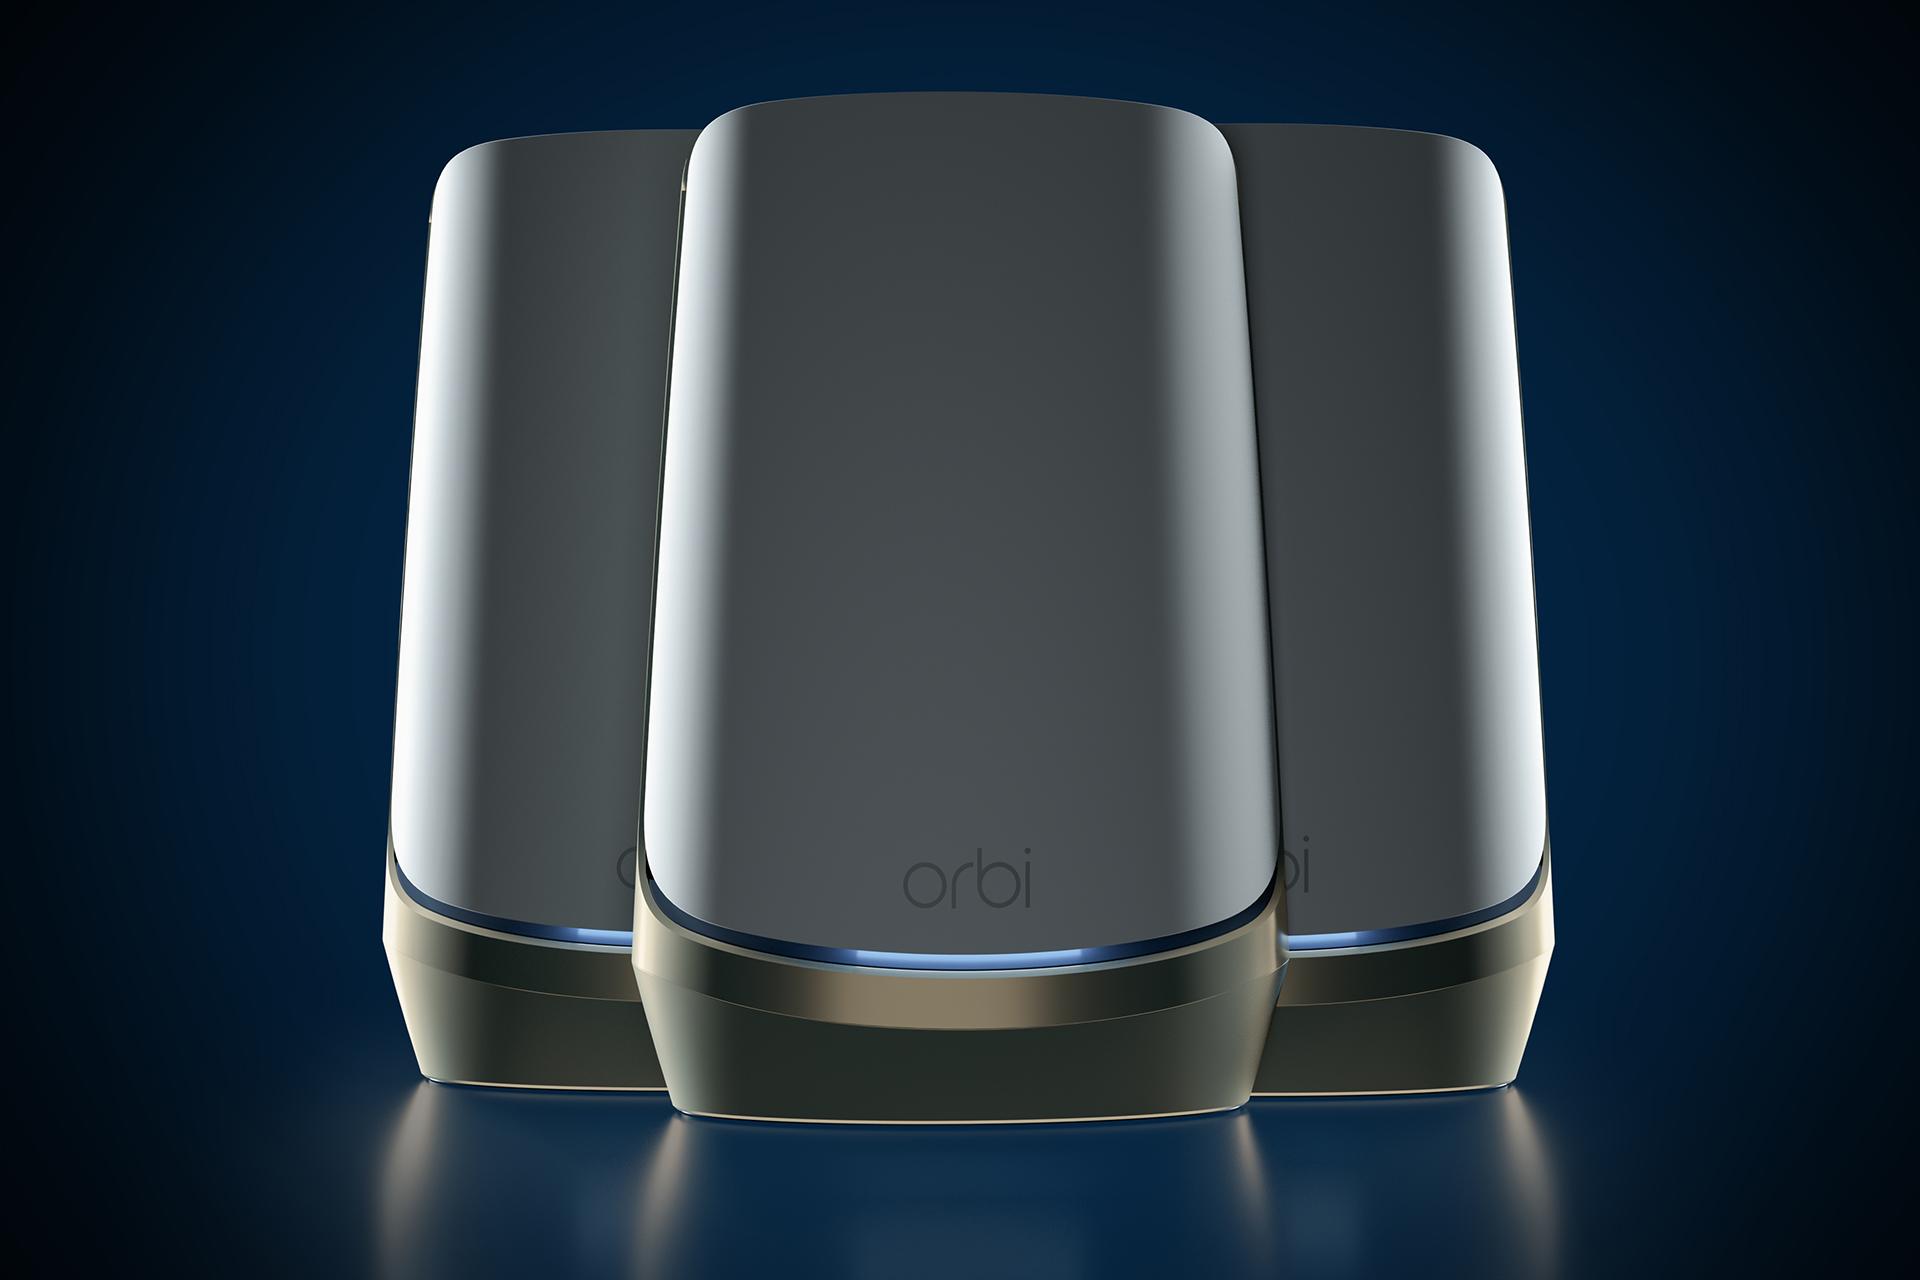 Netgear Orbi Quad-band WiFi 6E mesh router